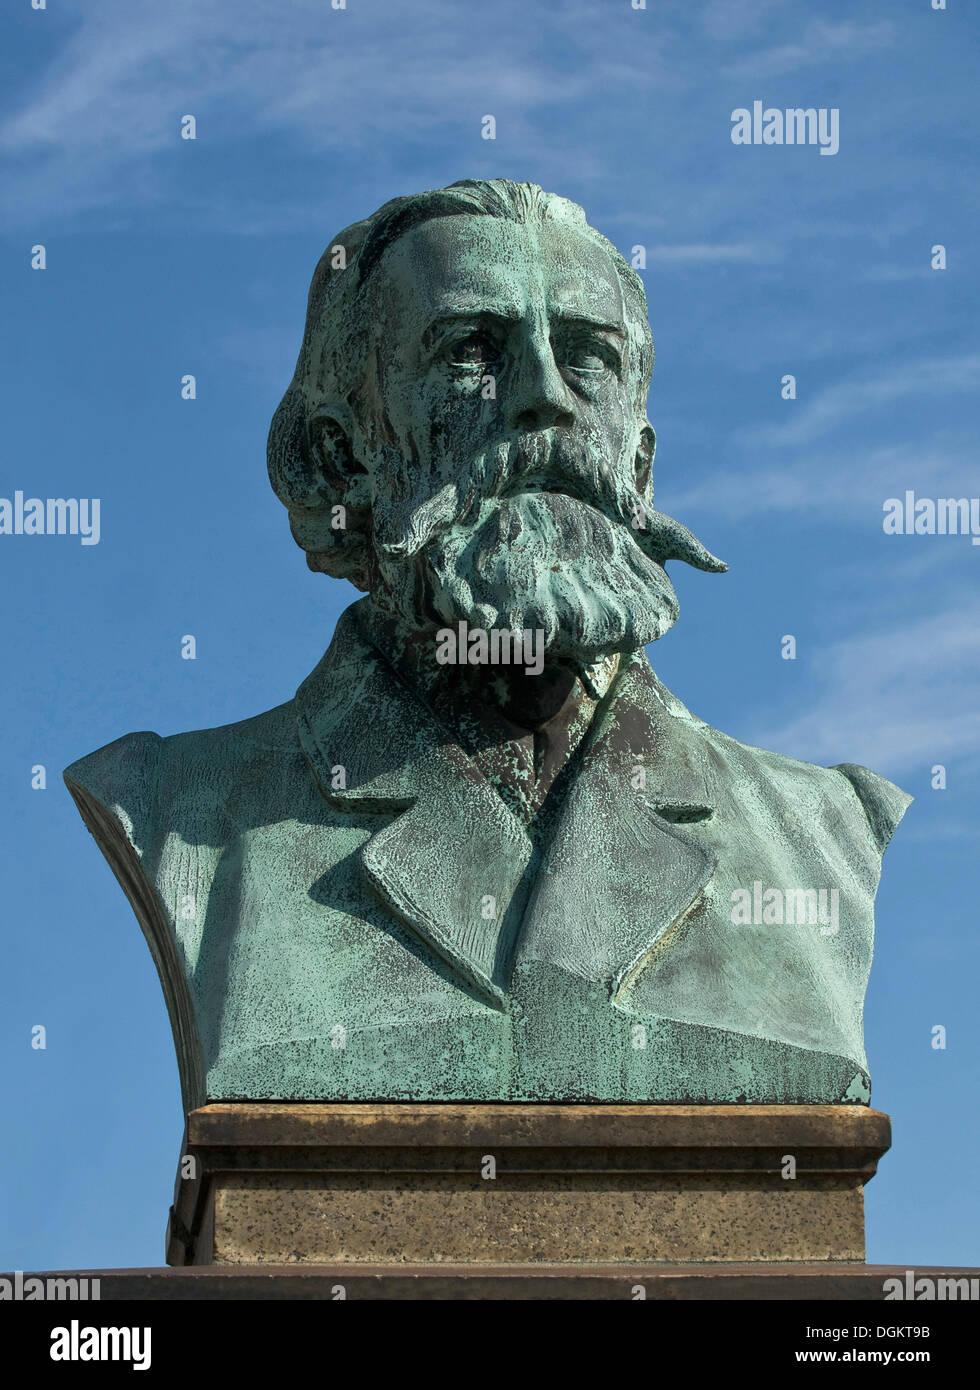 Wolfgang Mueller von Koenigswinter, poet, bust, Rheinallee, Koenigswinter, North Rhine-Westphalia - Stock Image